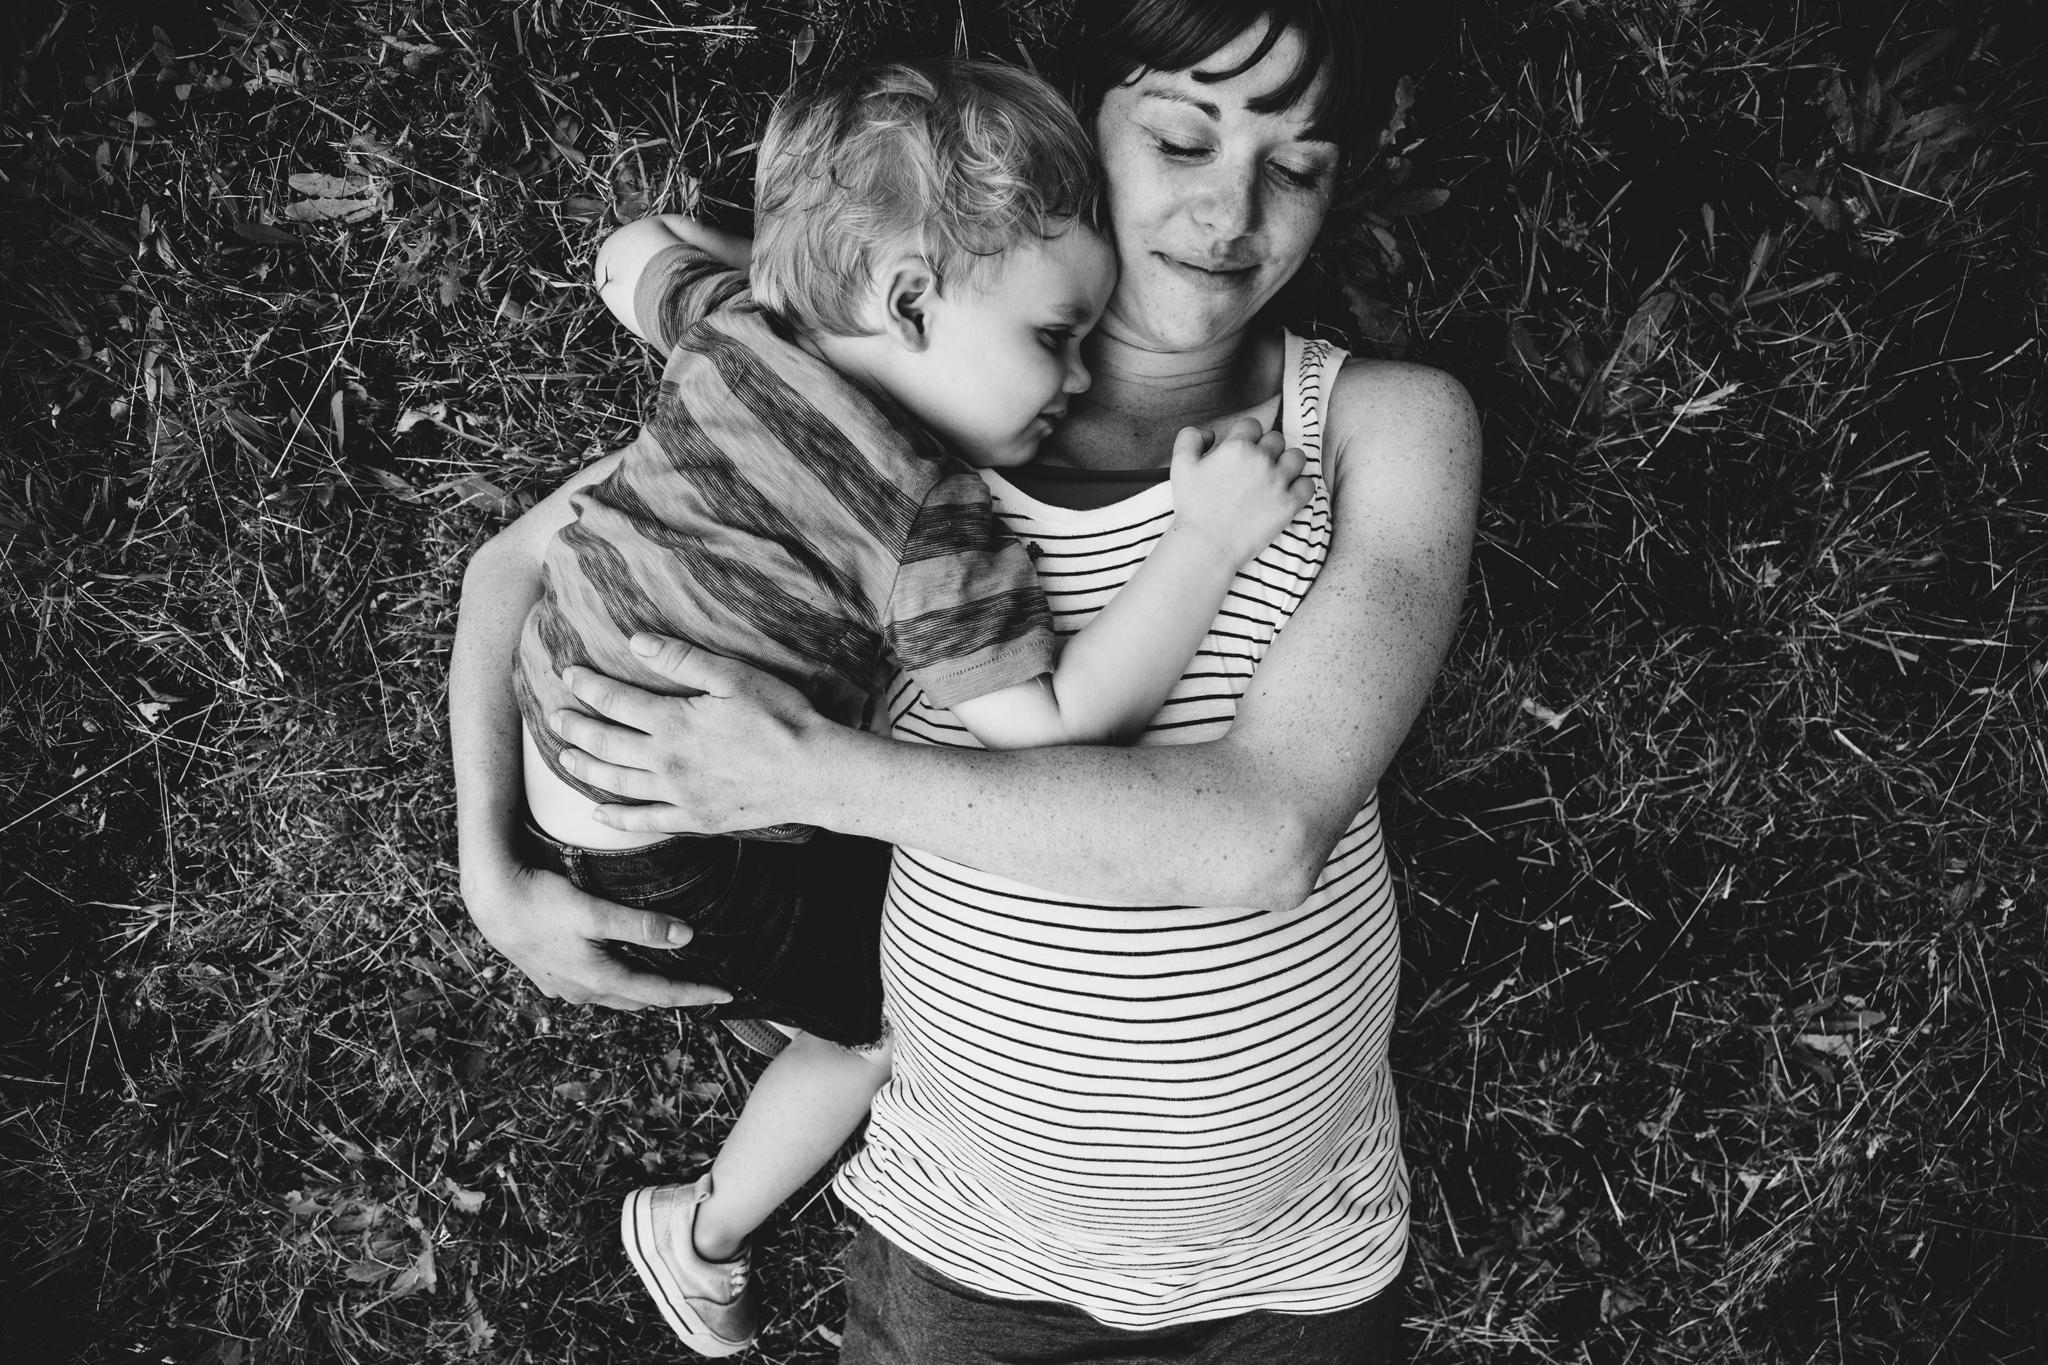 brayden justine hug-1.jpg